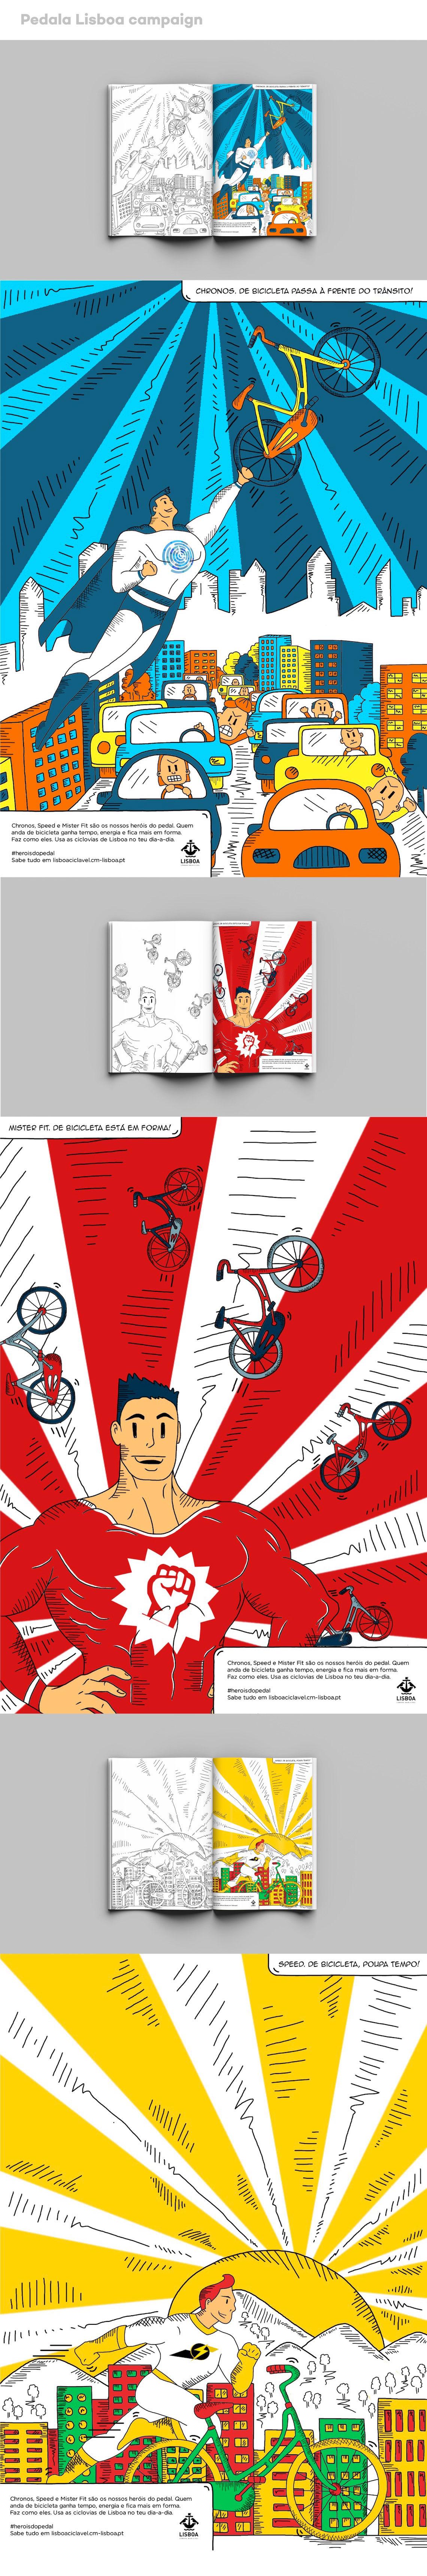 Advertising Proposal _Pedala Lisboa Campaign by Telma Paz